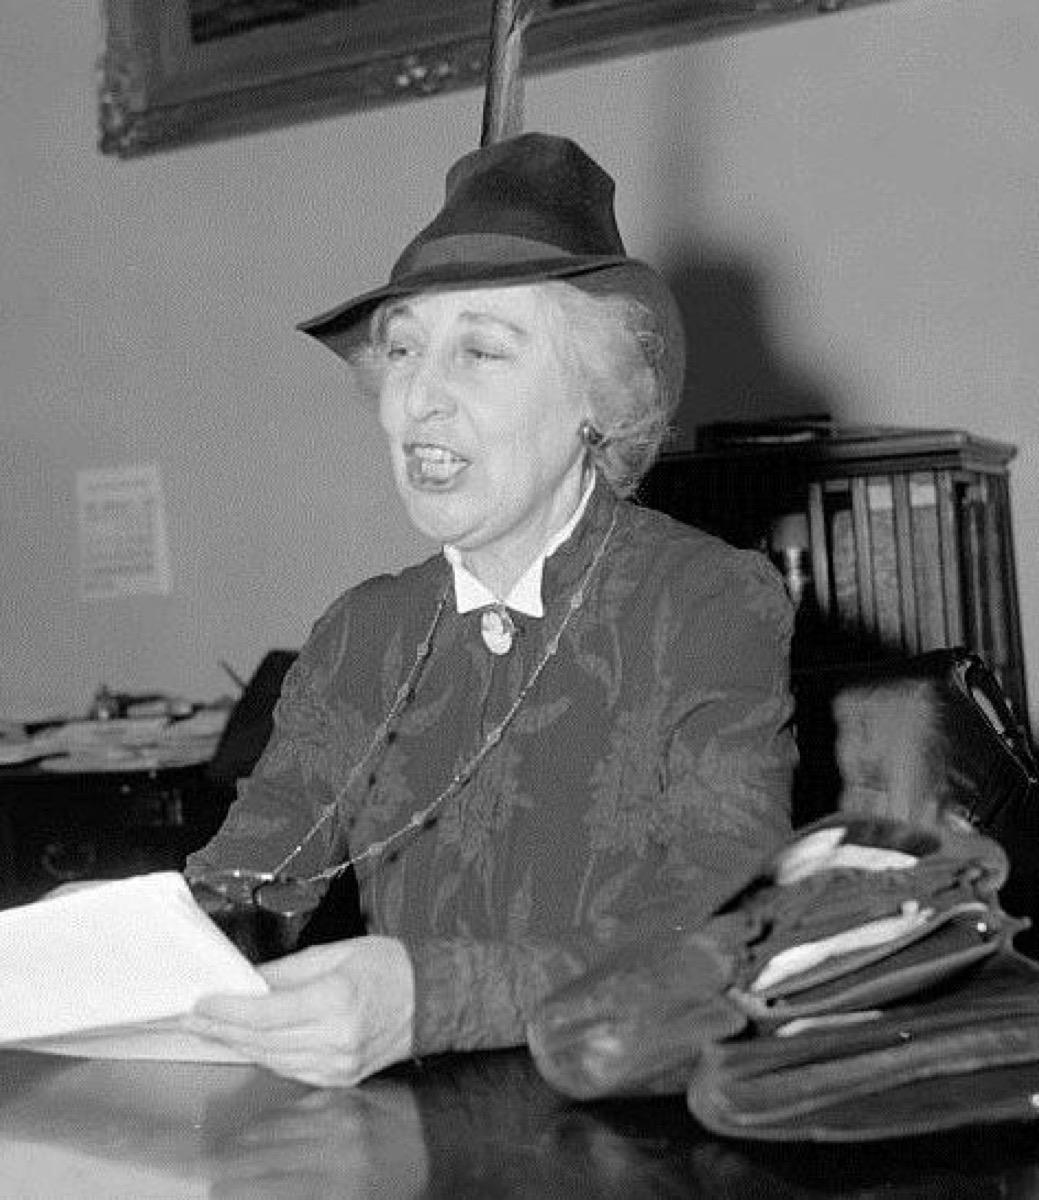 Jeannette Rankin historical facts